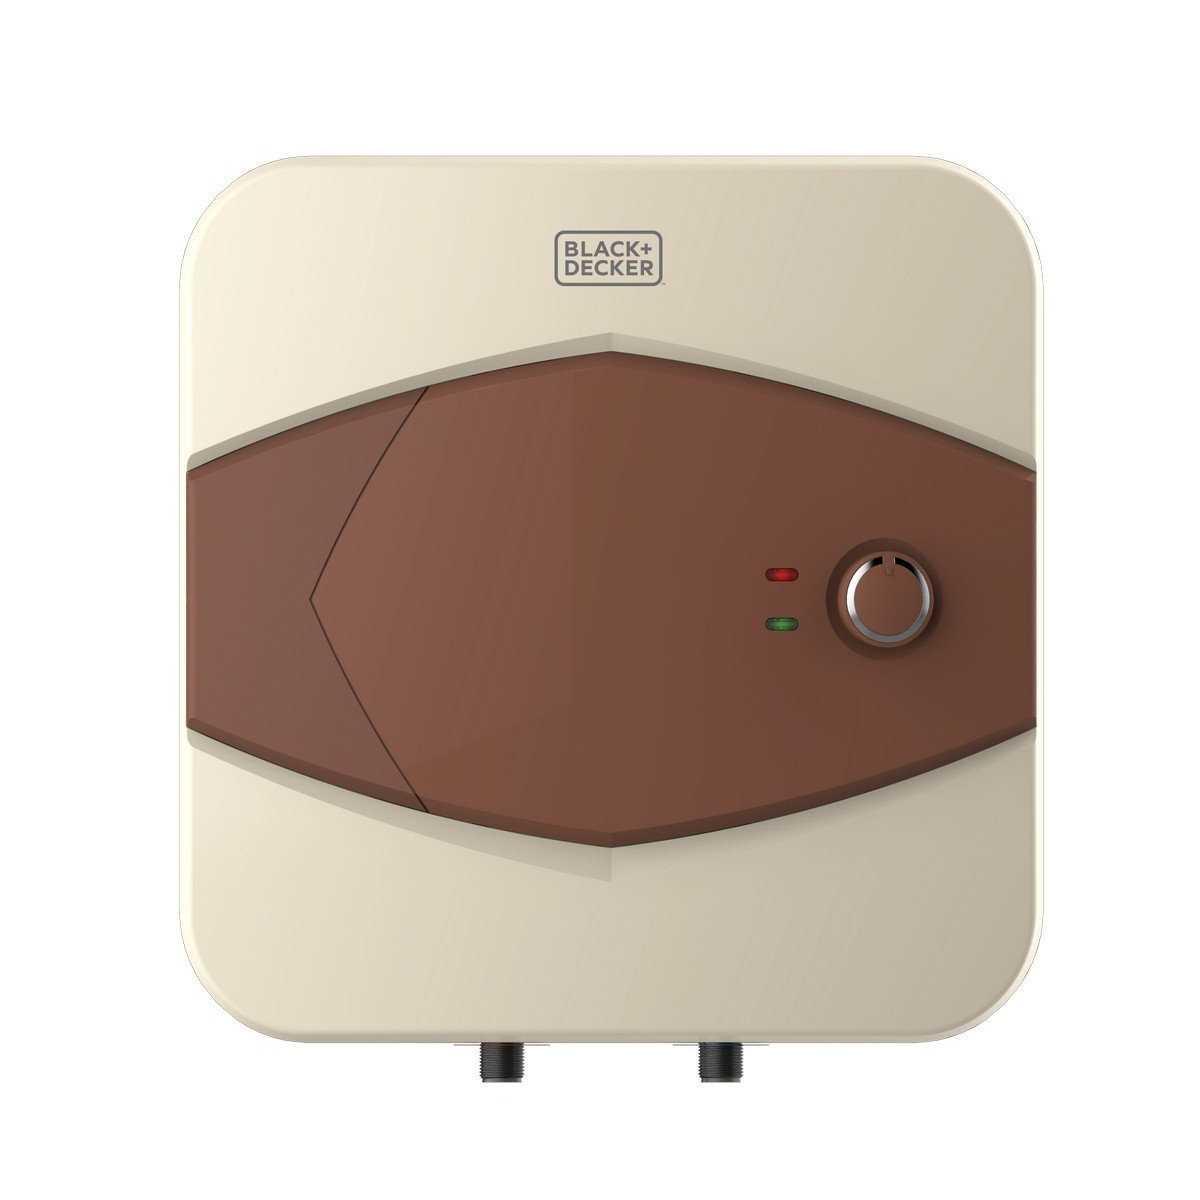 Black and Decker BXWH1503IN 15 Litre Storage Water Heater